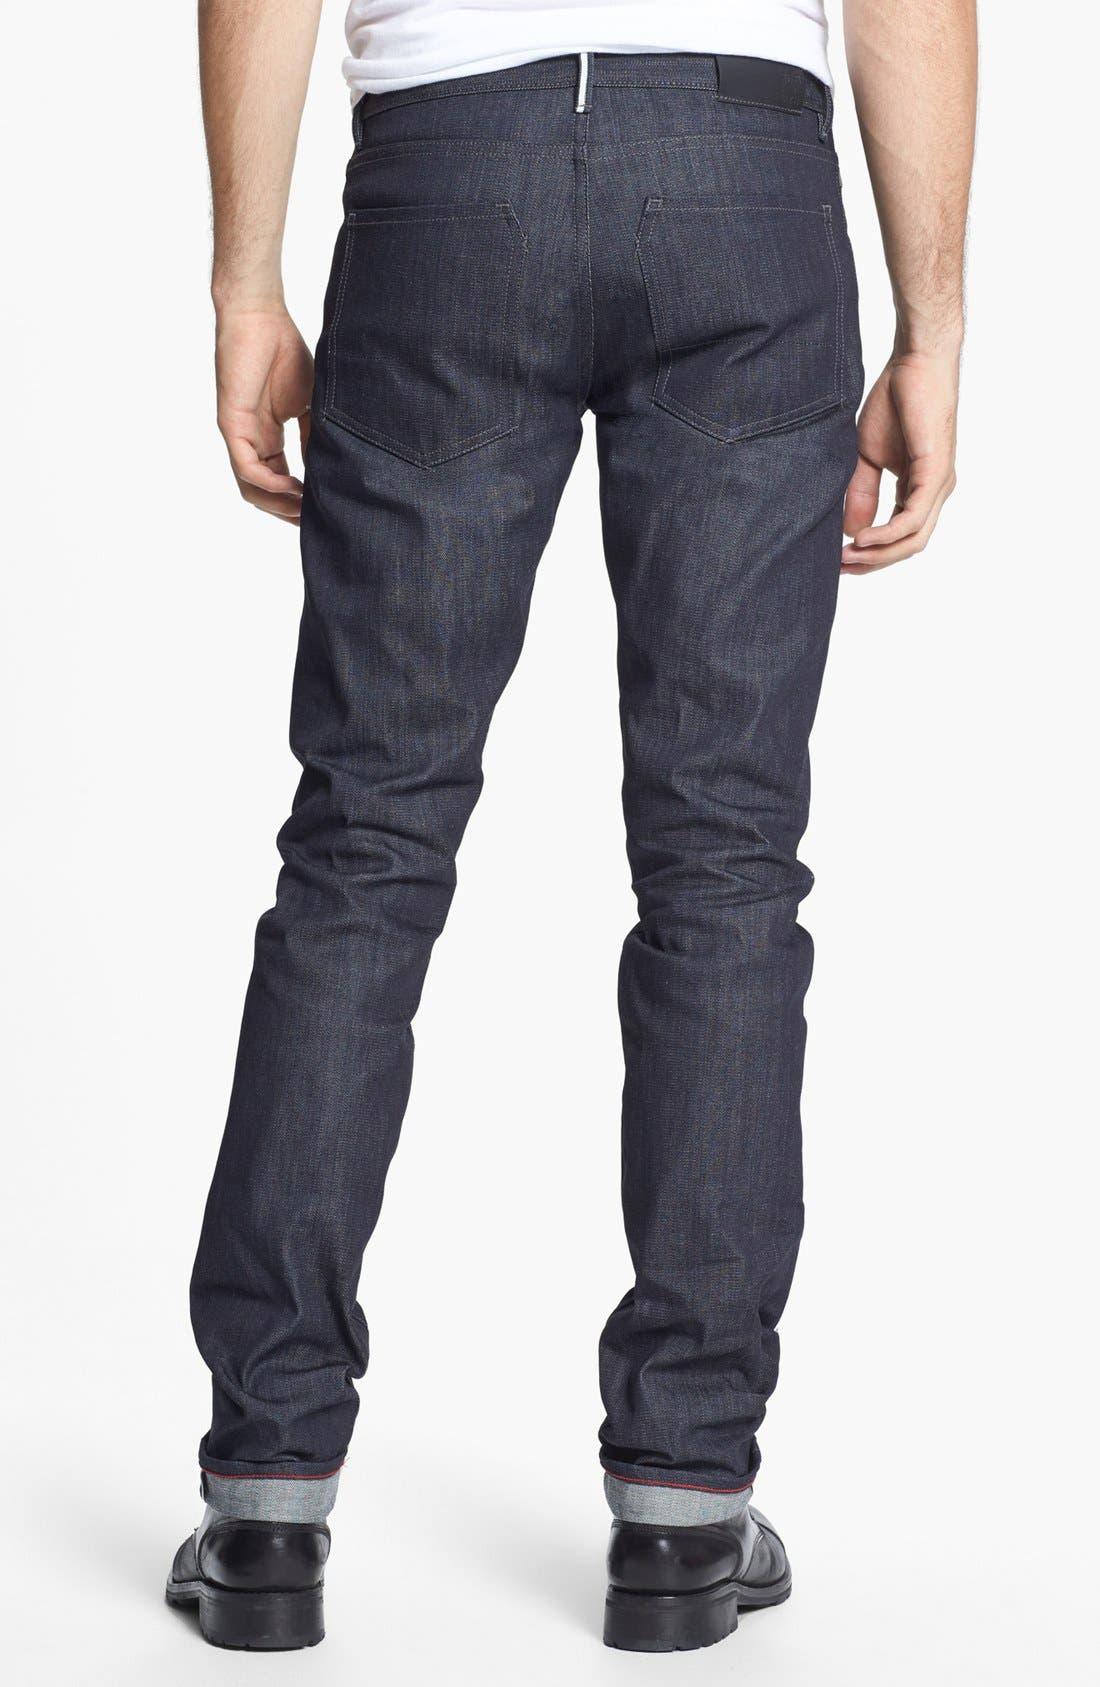 RALEIGH DENIM,                             'Martin' Skinny Fit Selvedge Jeans,                             Alternate thumbnail 4, color,                             401